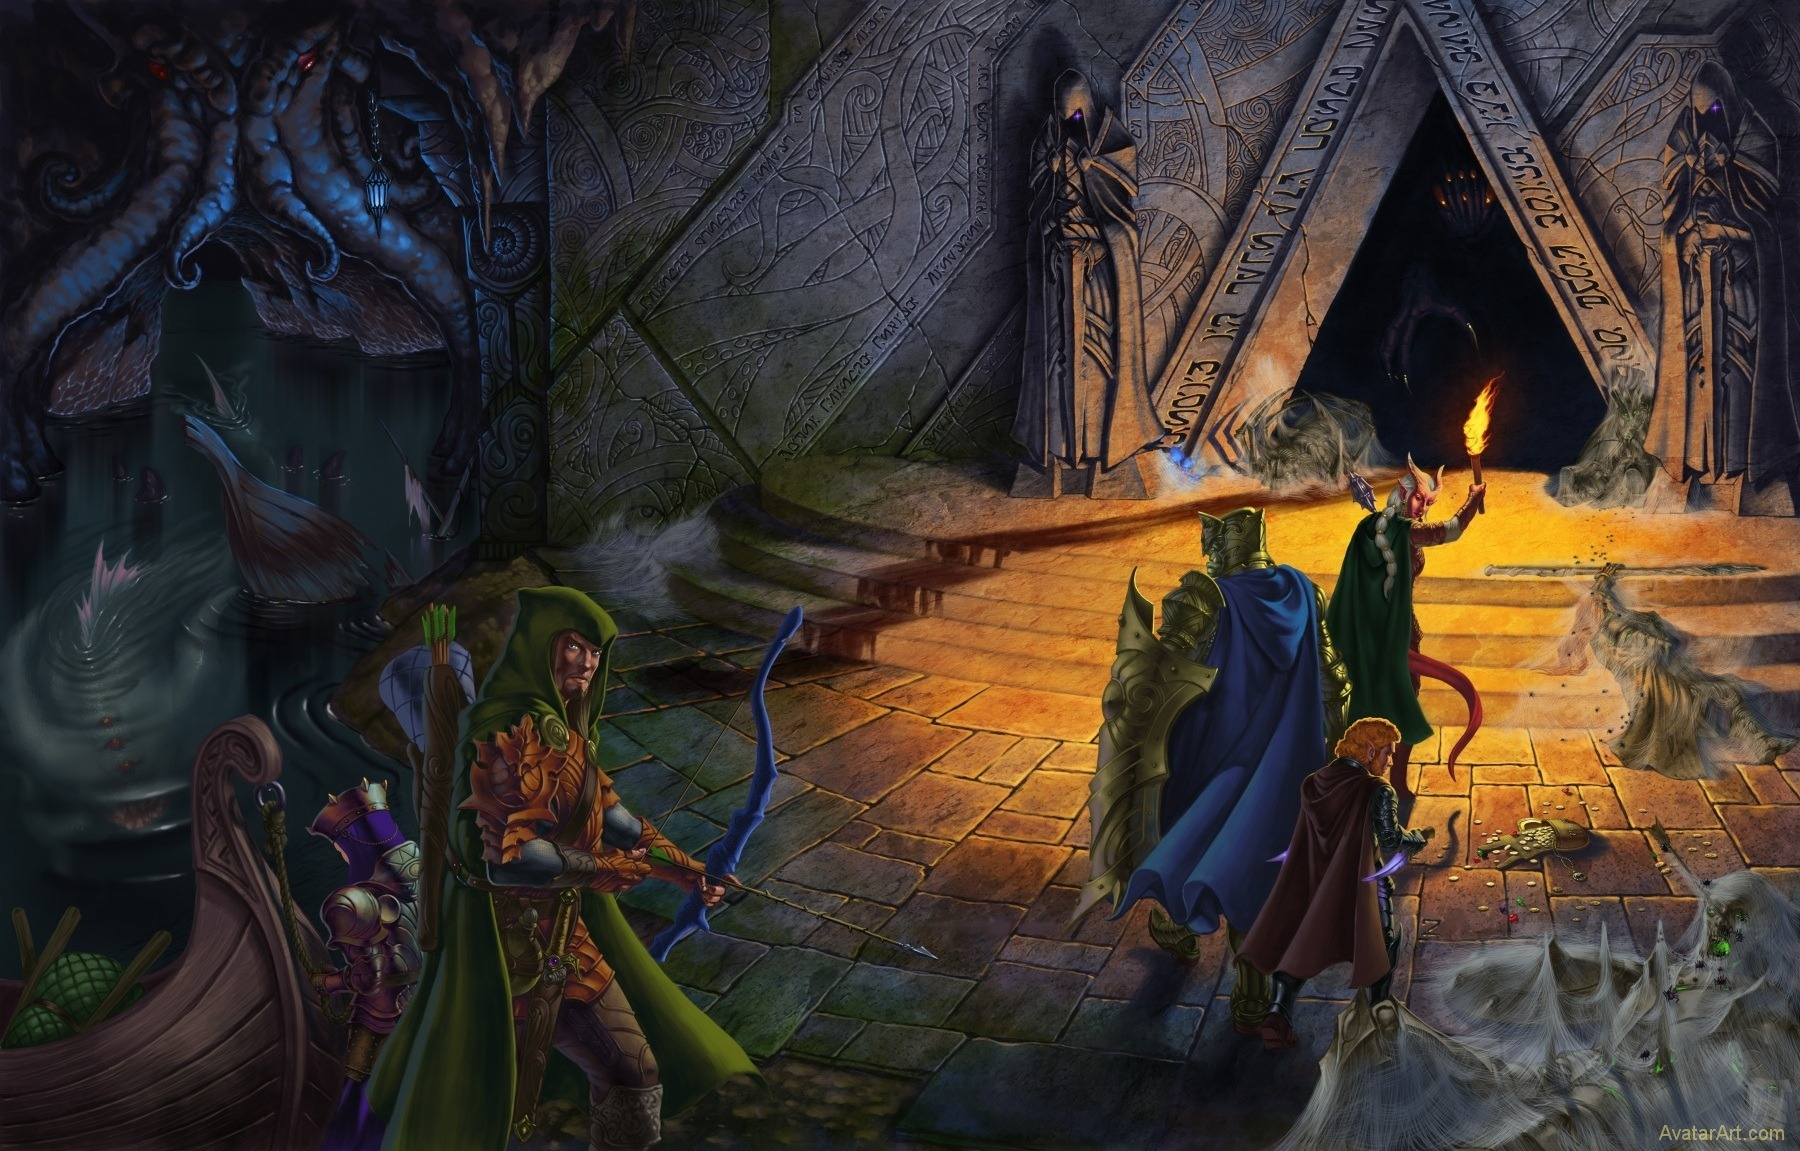 mini_dungeon_tome_cover_art_by_mateslaurentiu_dco7wlj